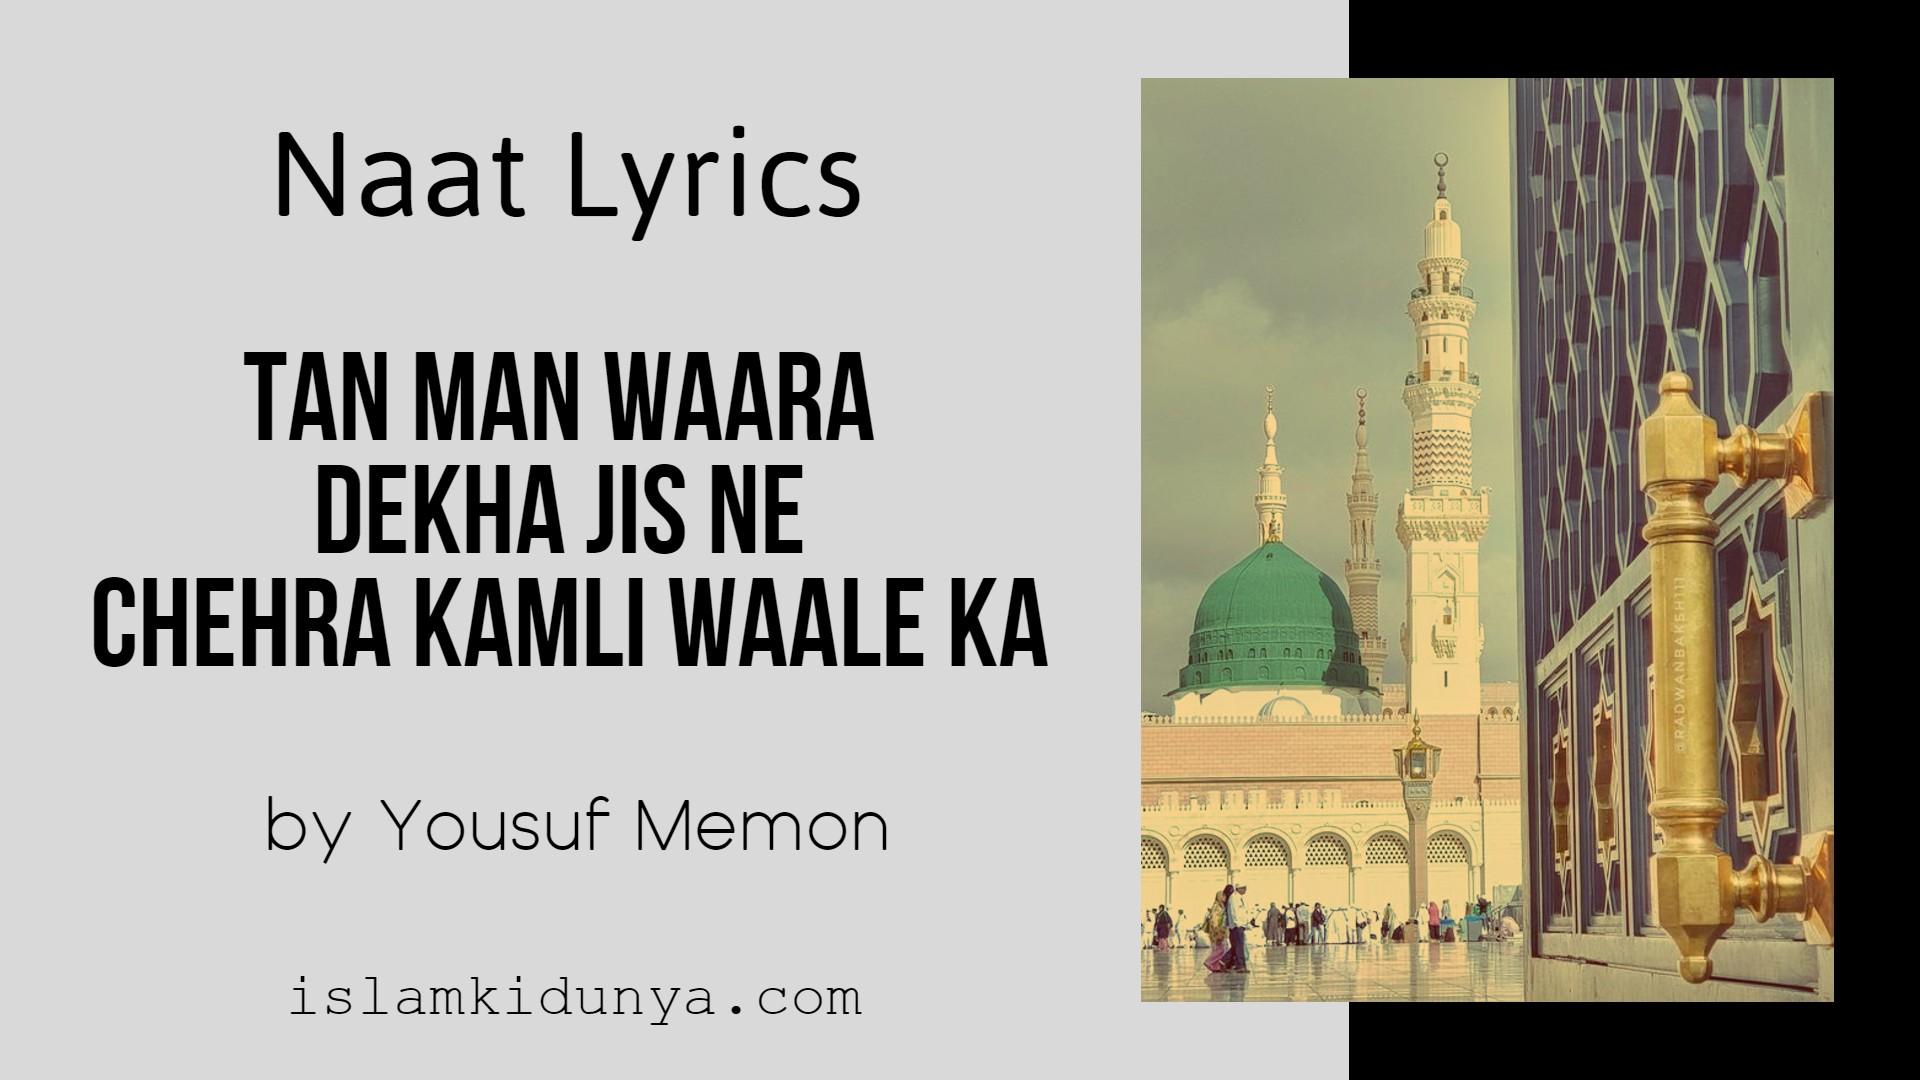 Tan Man Waara Dekha Jis Ne Chehra Kamli Waale Ka - Naat Lyrics